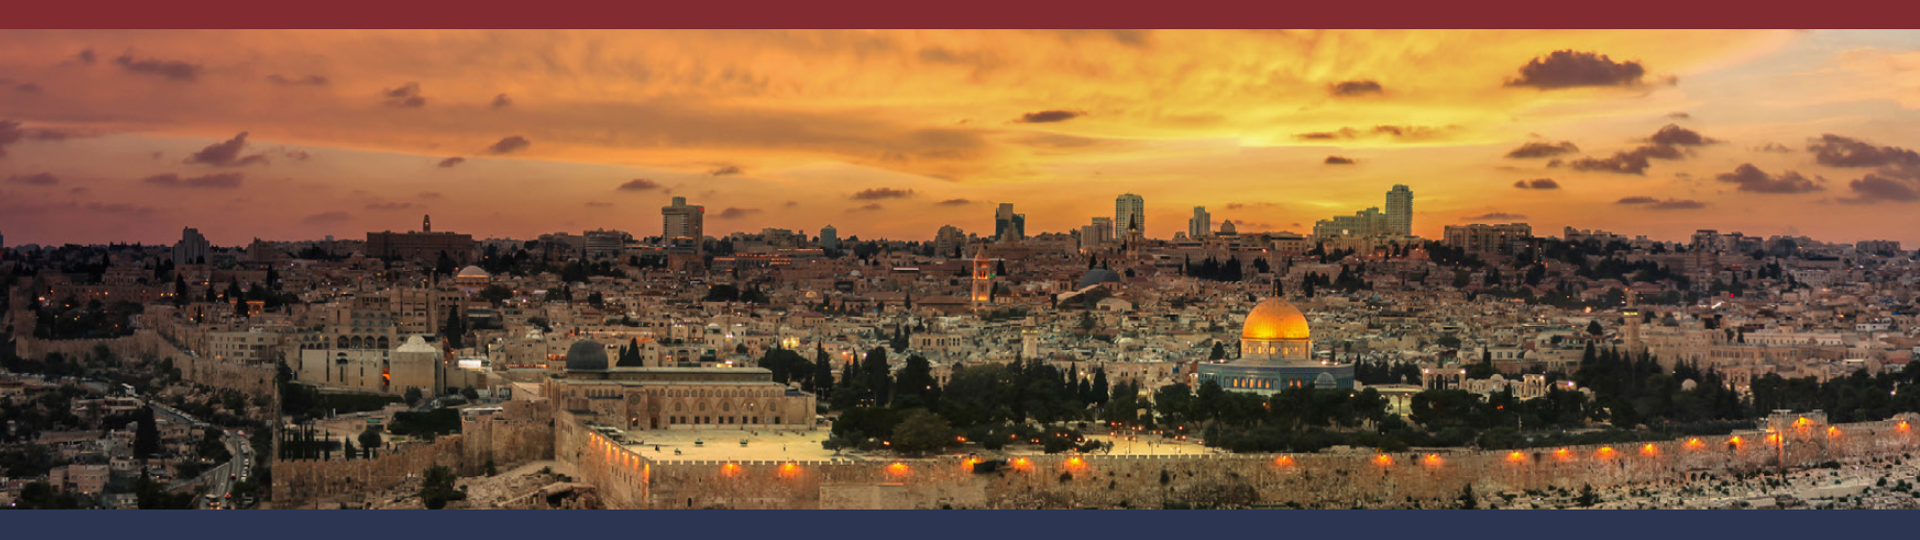 Picture of the Jerusalem, Israel skyline